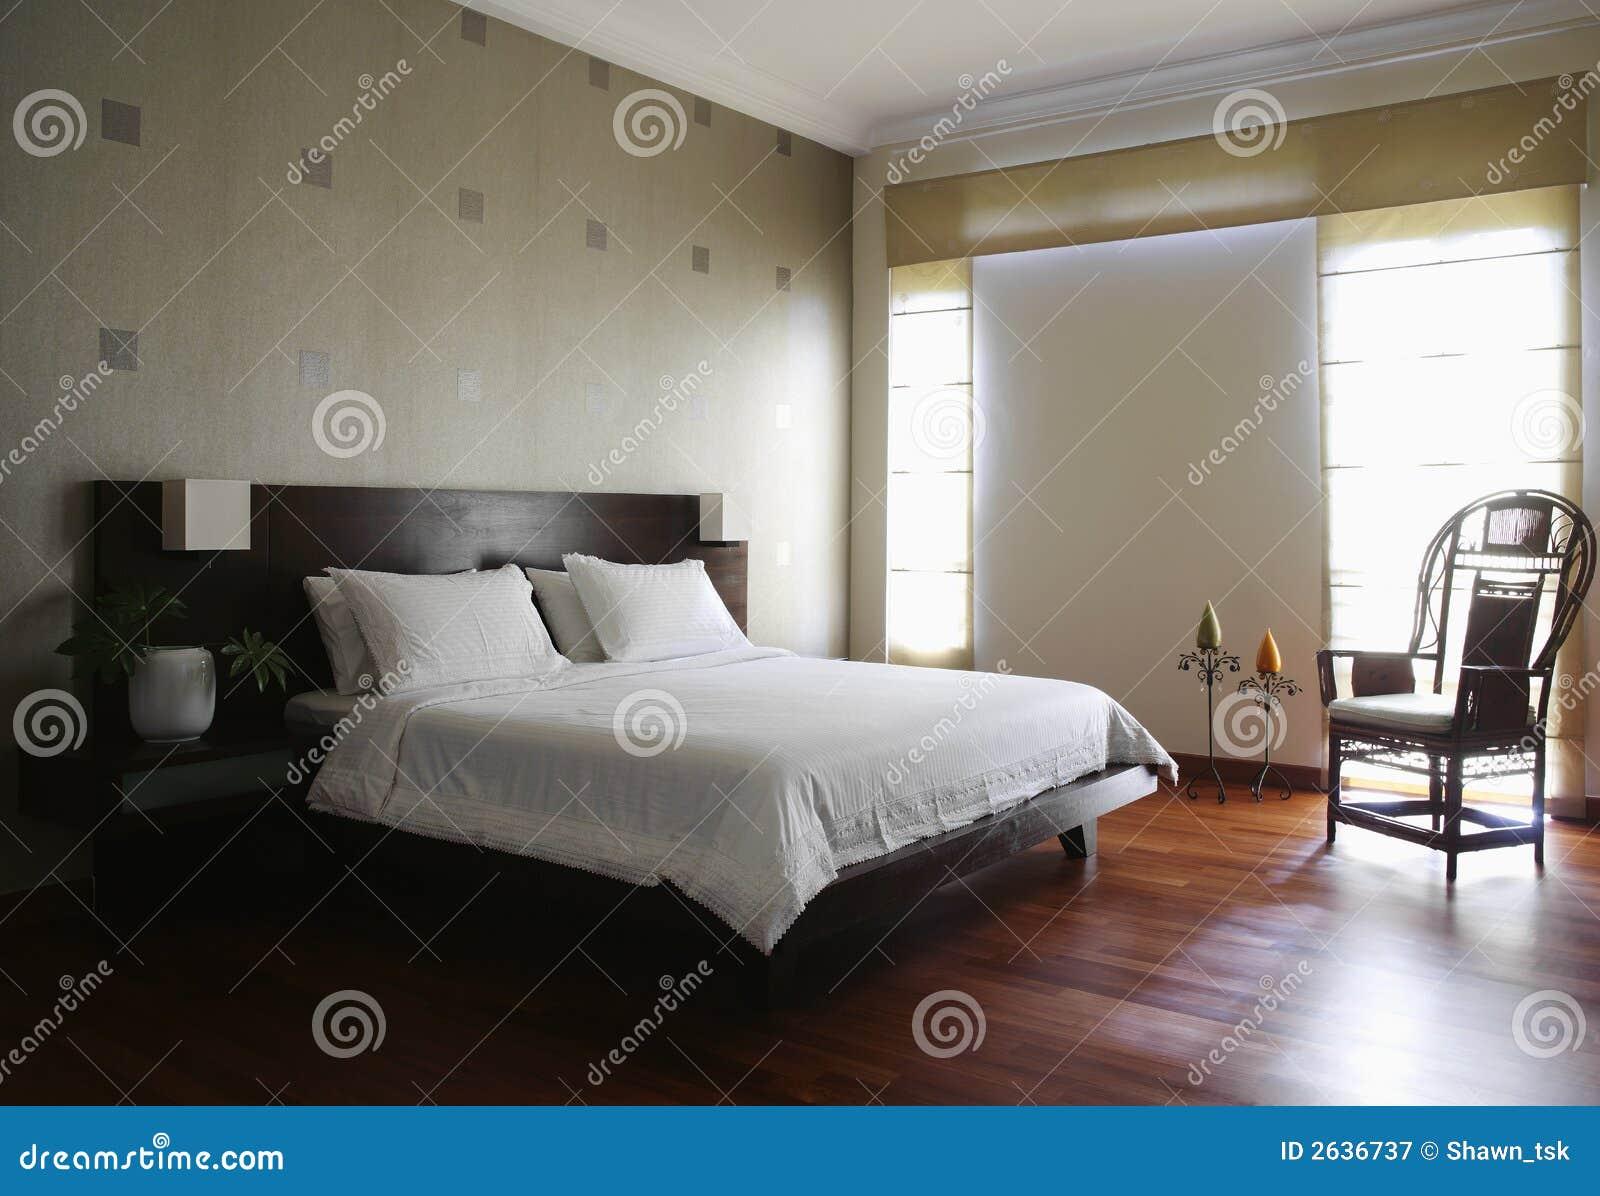 Dise o interior dormitorio fotograf a de archivo libre - Diseno dormitorio ...